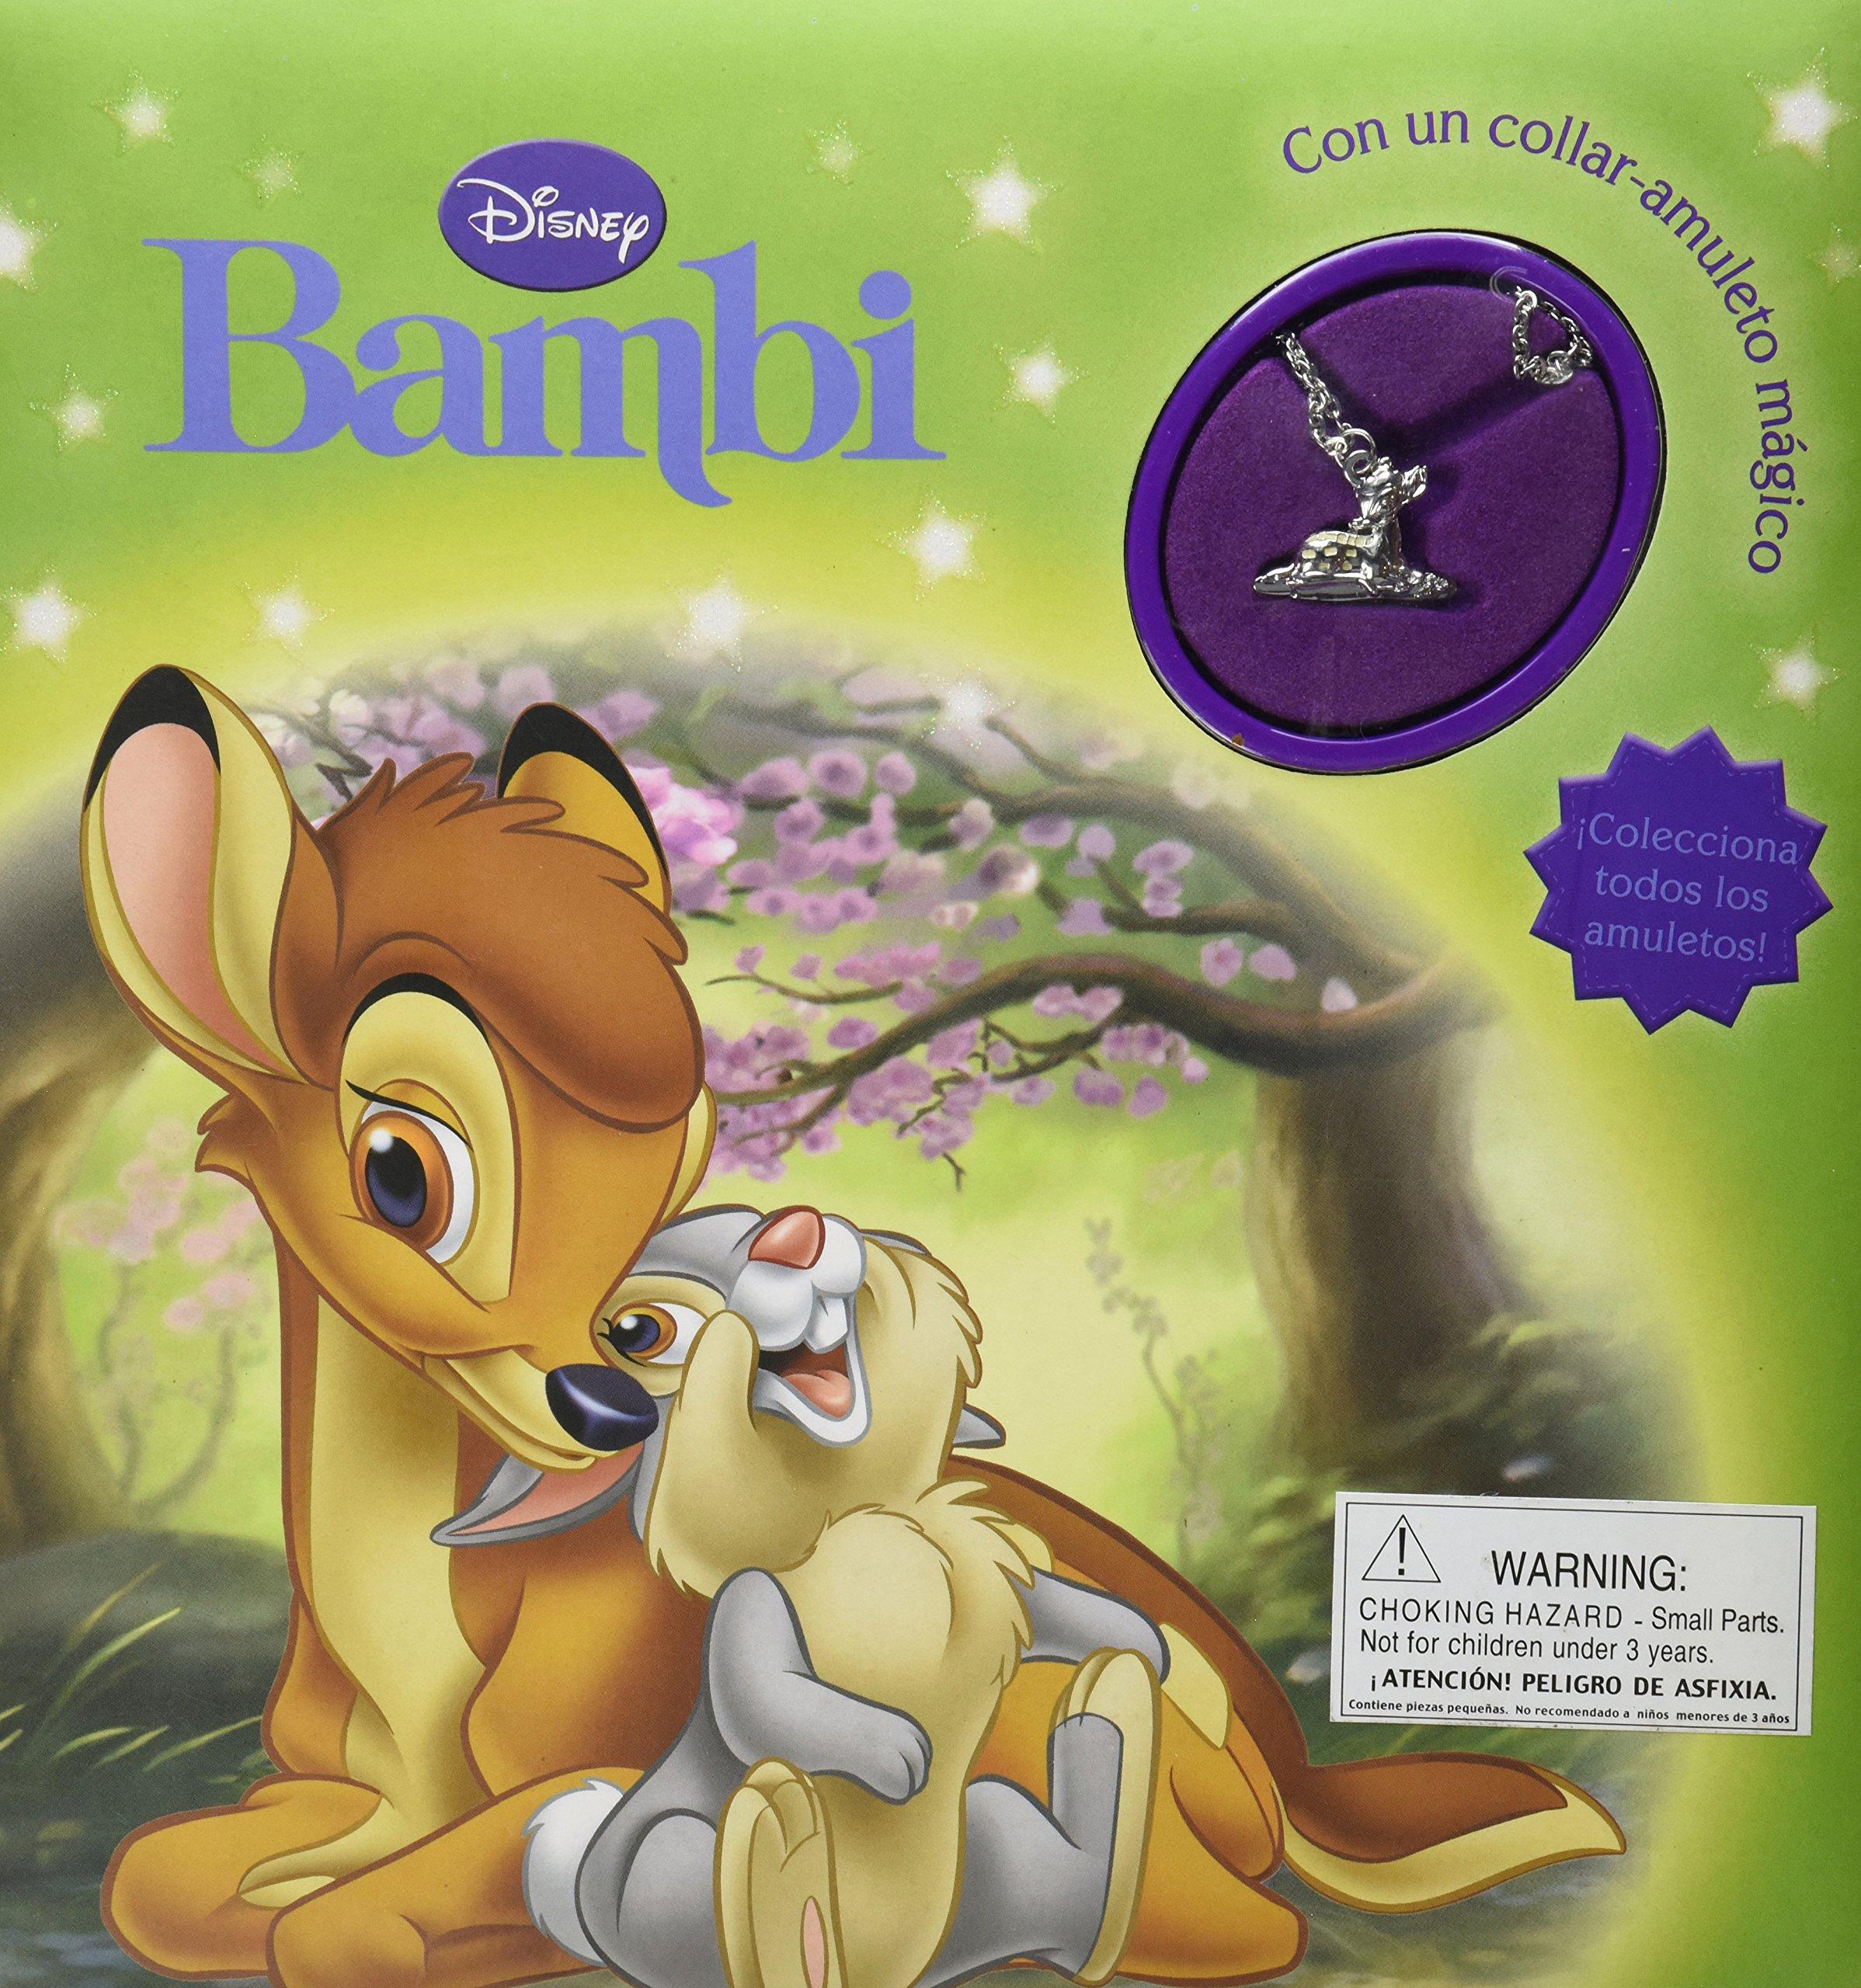 Read Online Disney Bambi con un collar-amuleto magico (Disney Charm) (Spanish Edition) pdf epub